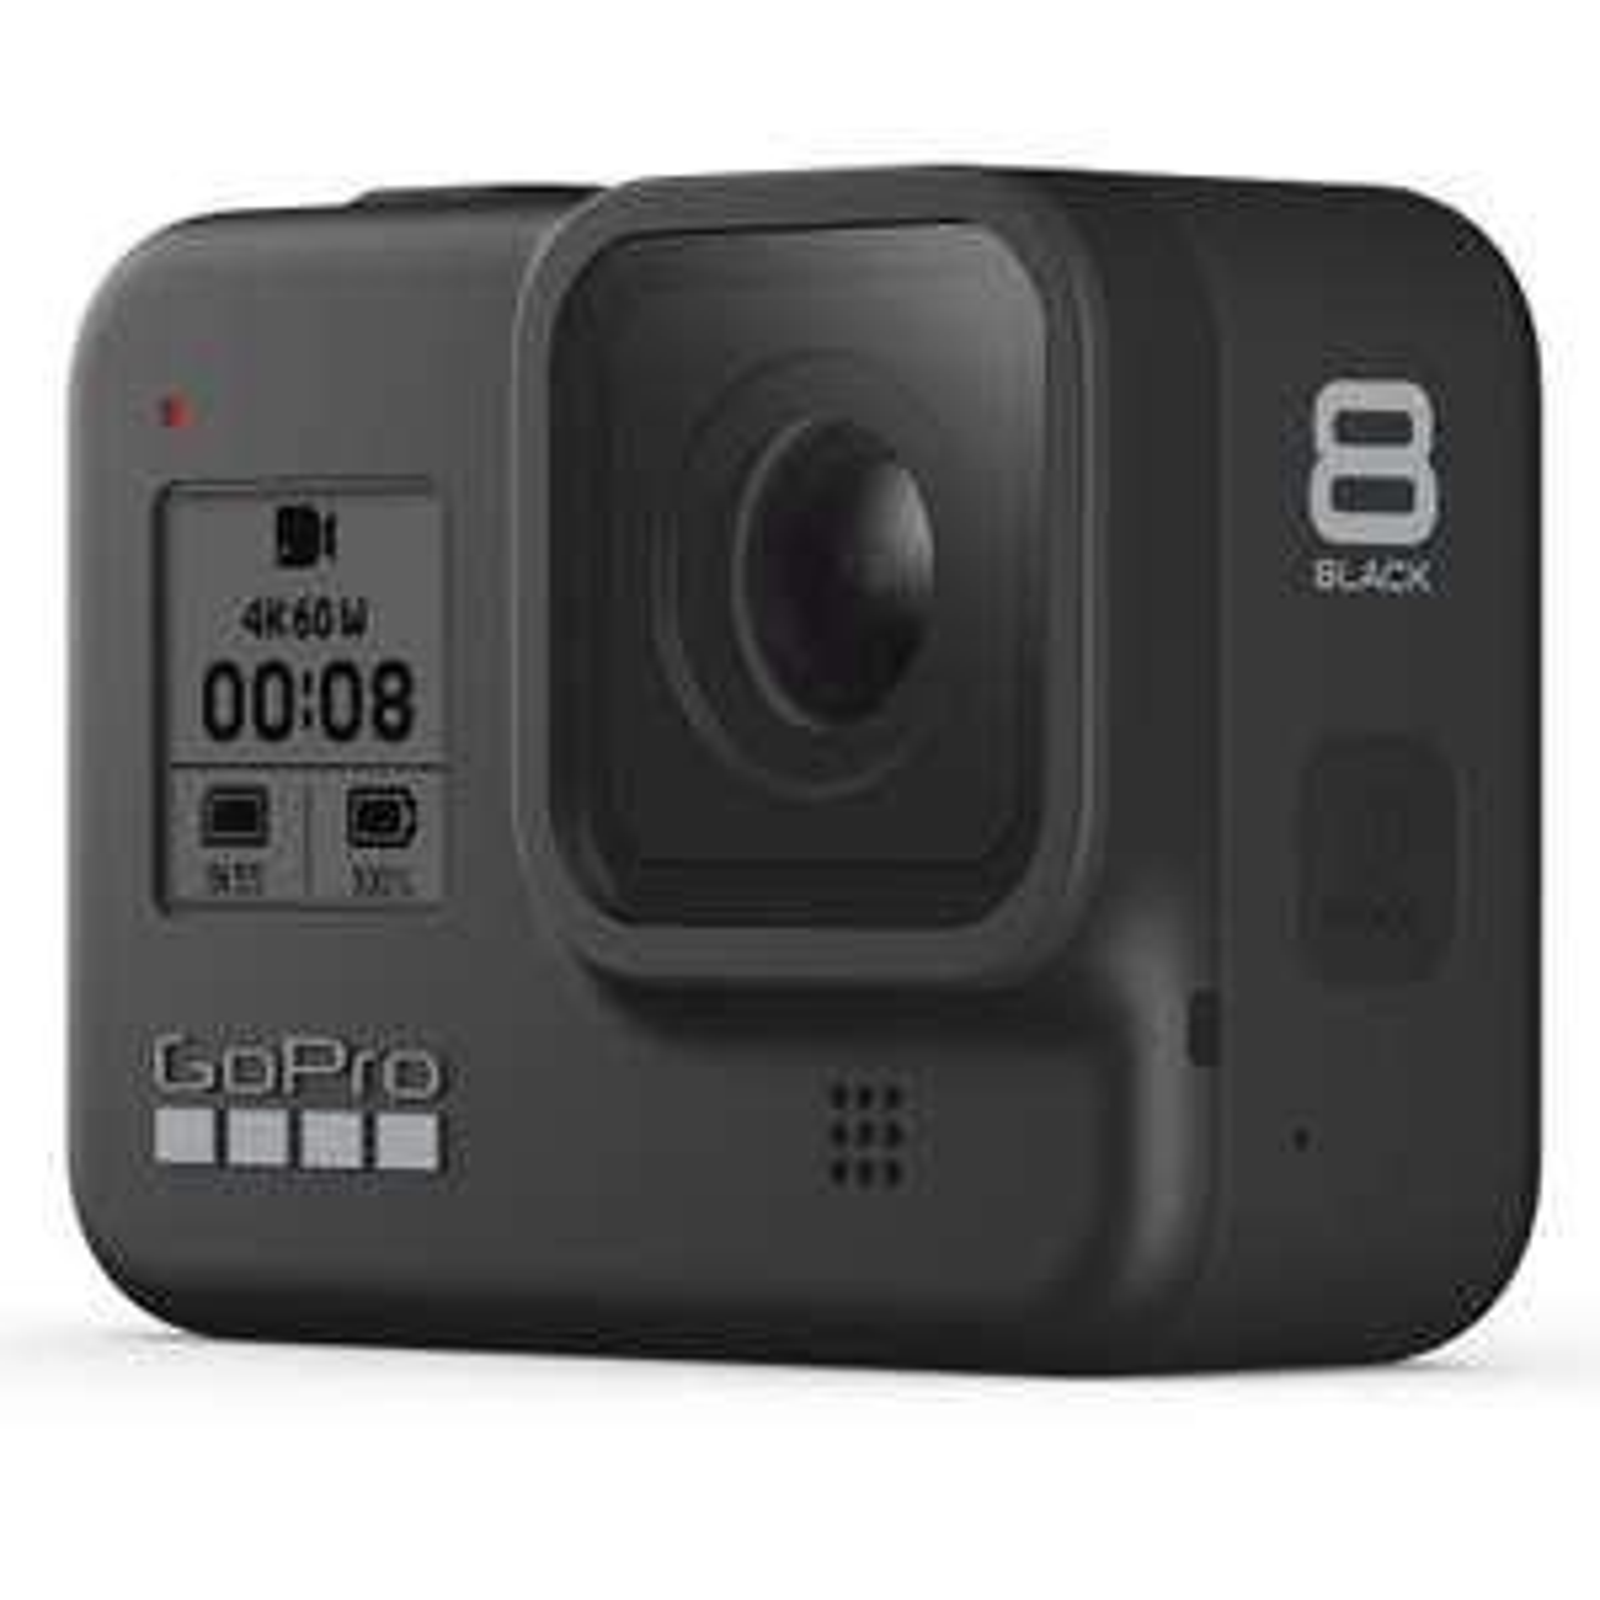 Caméra GoPro Hero 8 Black - 4K / 60 fps, 12 MP, HDR, WiFi/Bluetooth, GPS